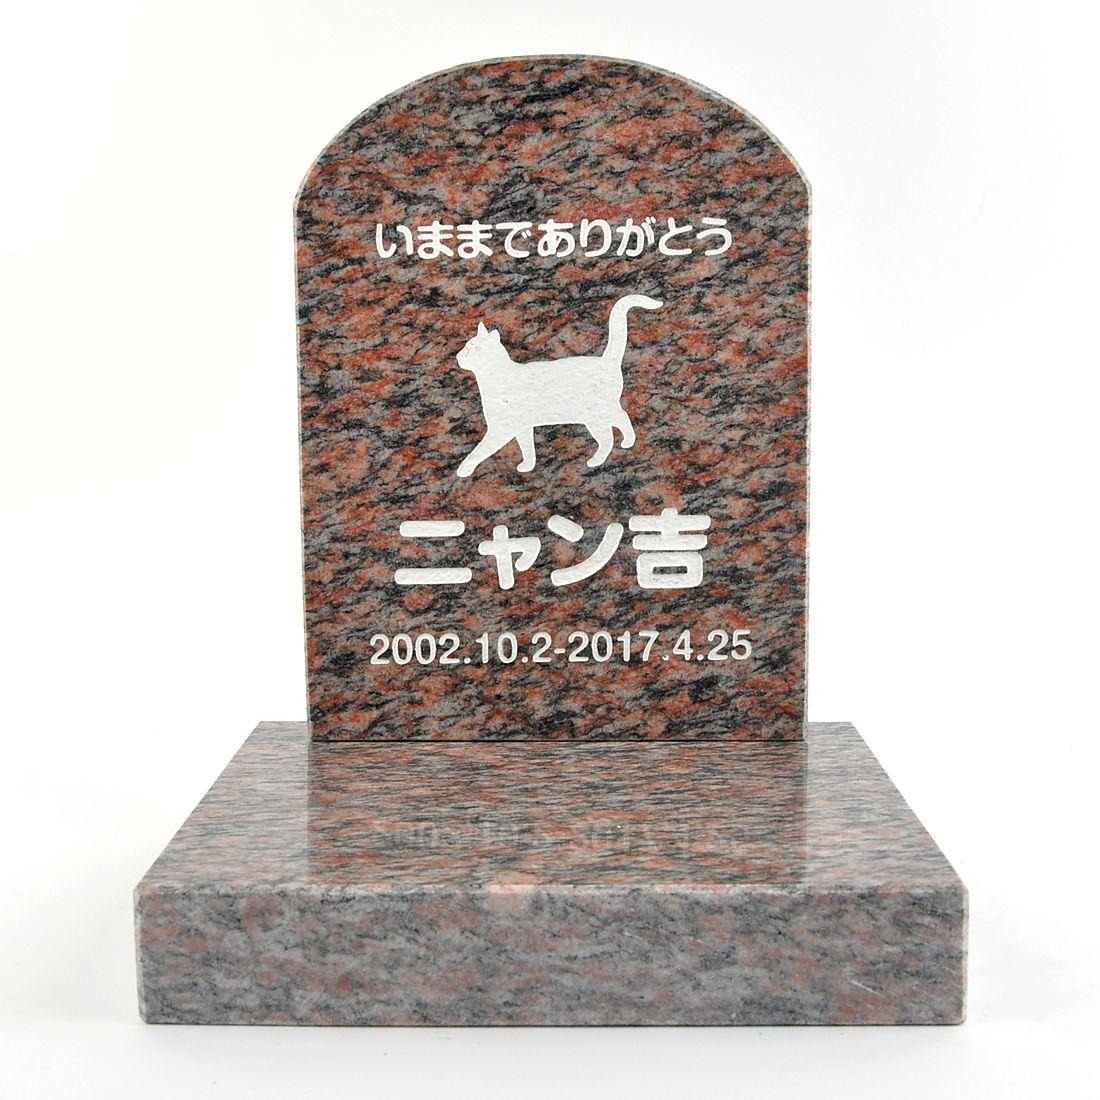 Pet&Love. ペットのお墓 天然石製 セット型 底板が厚く重いタイプ 御影石 レッド スタンダード  【HLS_DU】【楽ギフ_名入れ】 attr177attr ctgr2ctgr sml3sml+ctgr2ctgr CAT